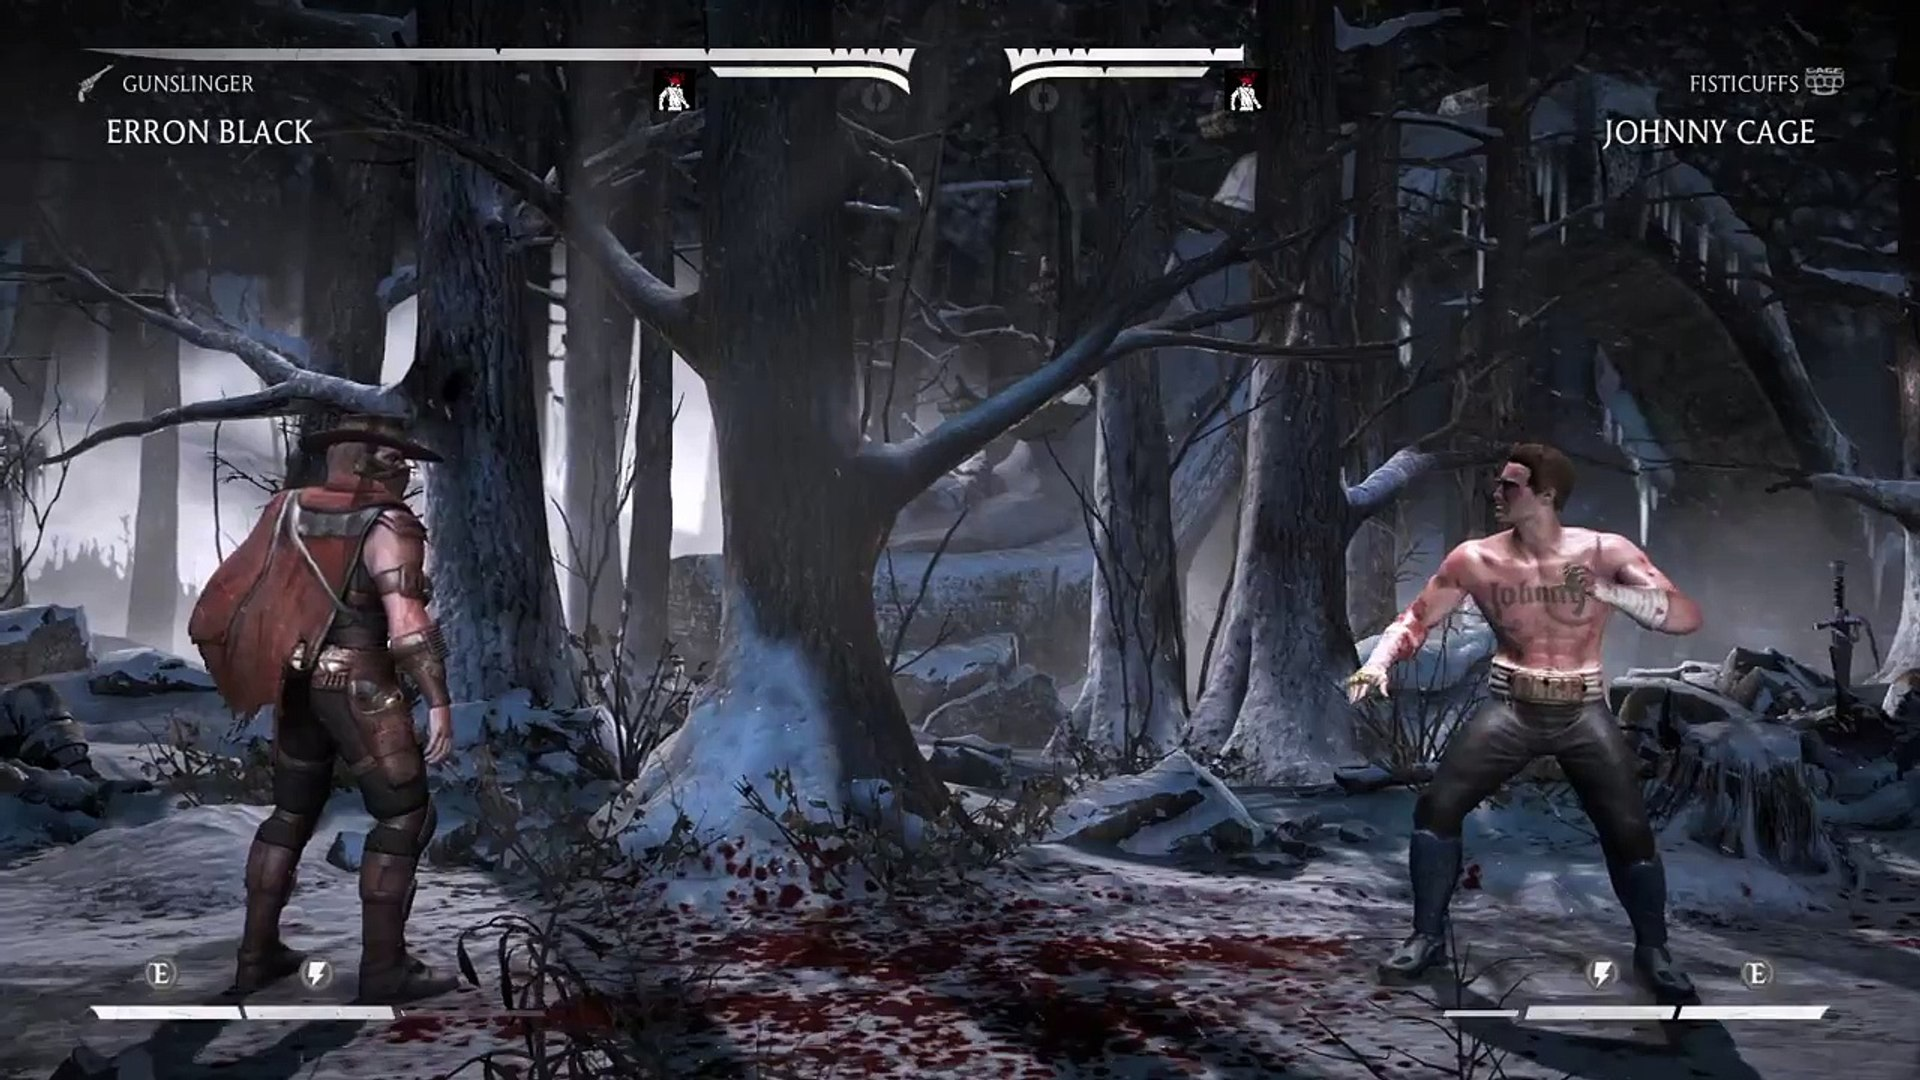 Mortal Kombat X Erron Black Brutality 2